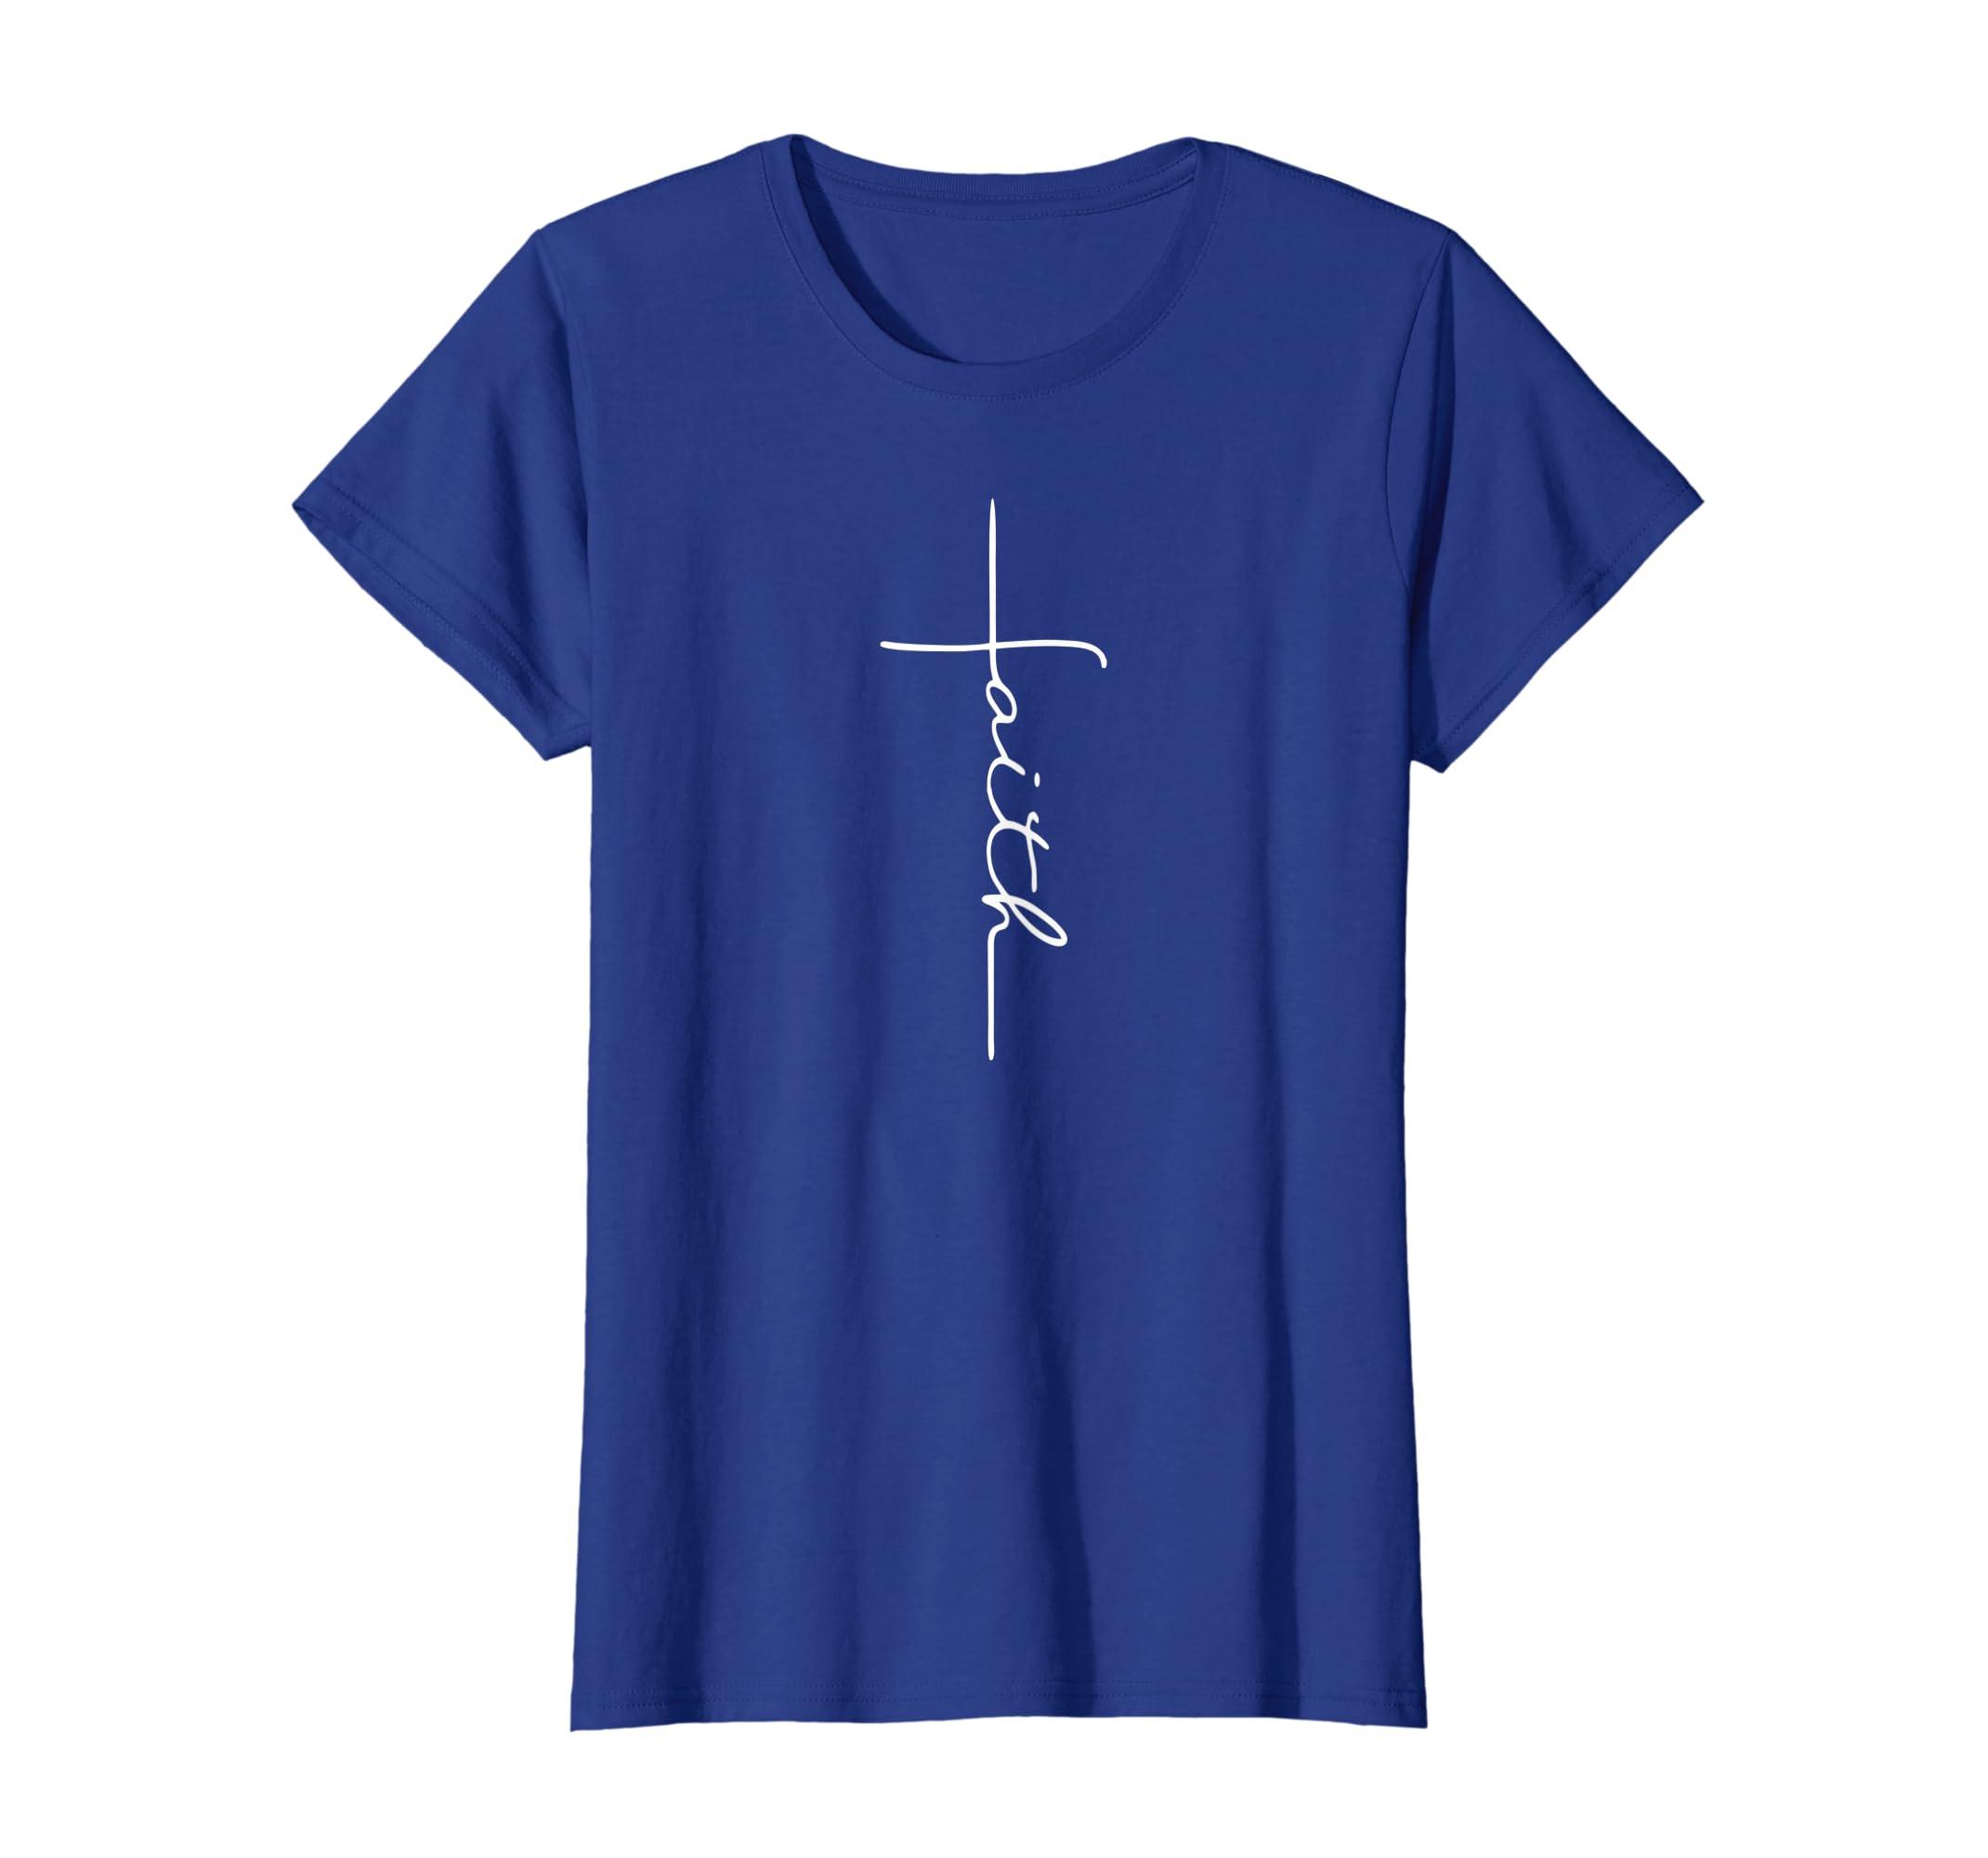 8a81c5358 Amazon.com: Faith Cross T-Shirt Christian T Shirt for Men Women Kids:  Clothing